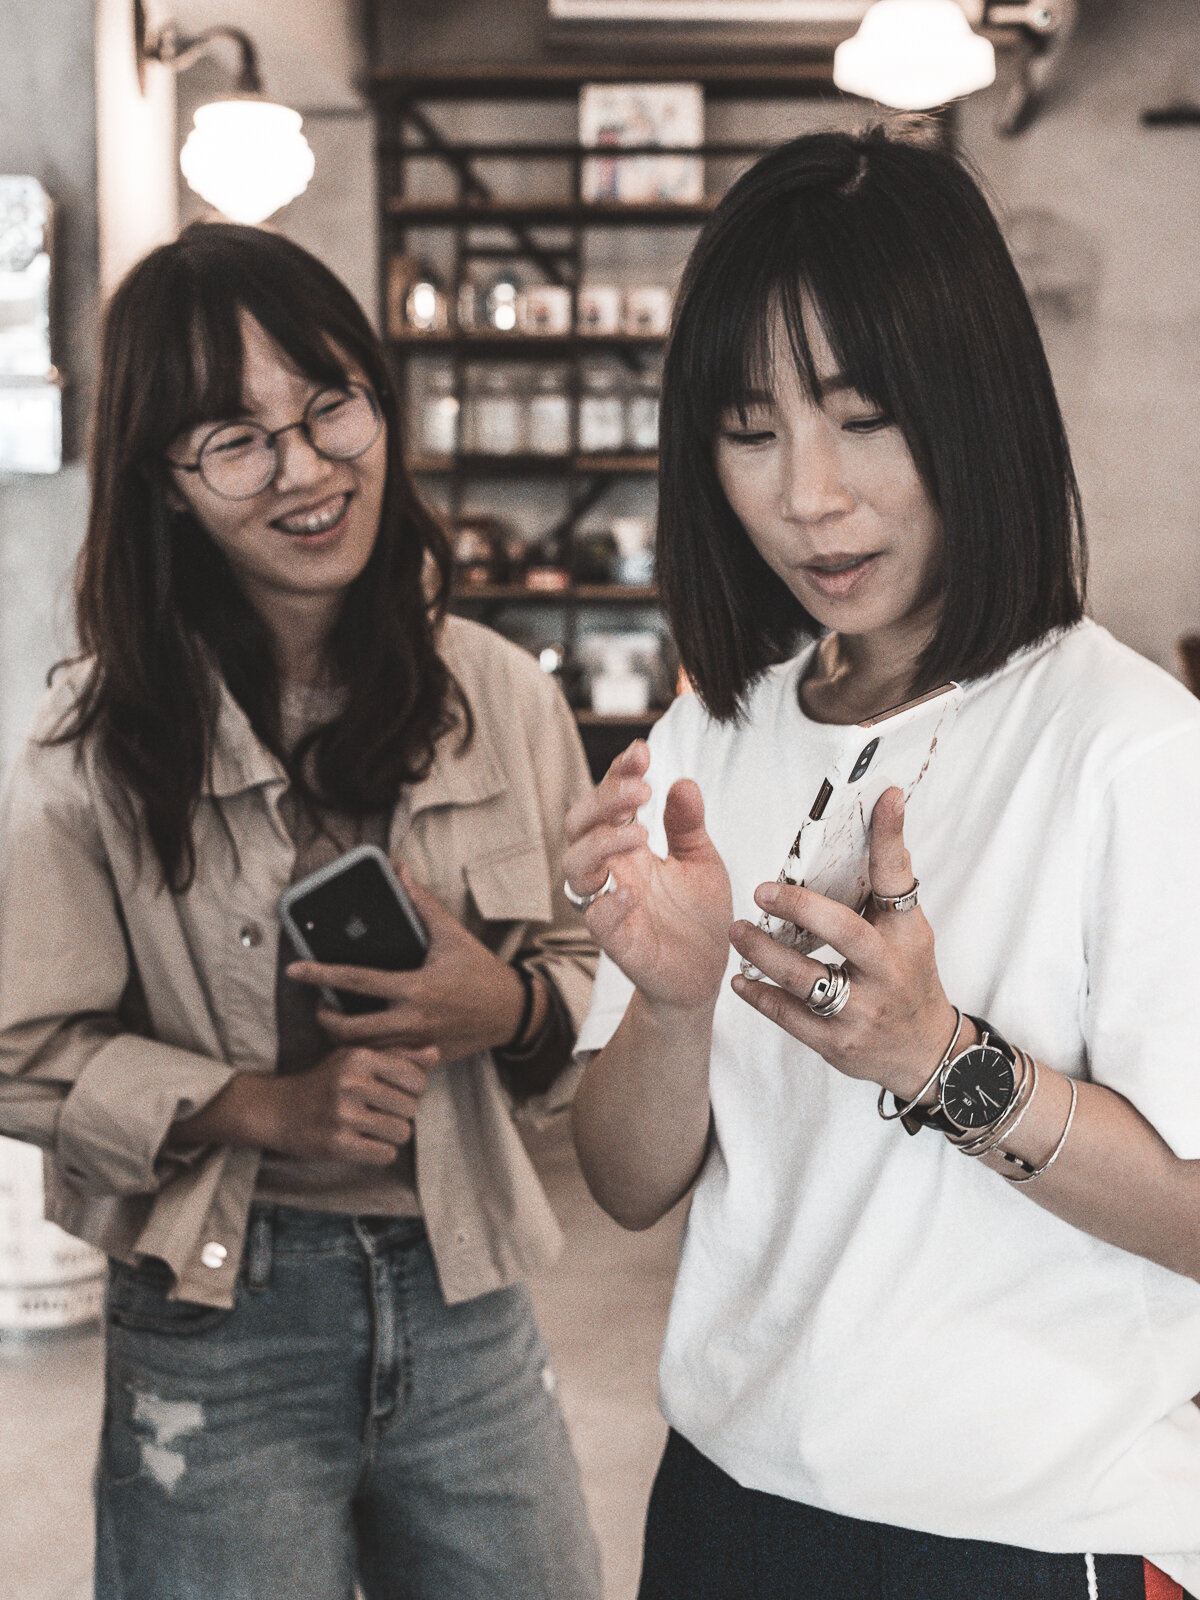 Charming Chat Photography Workshop - Olympus EM1 Markii 2512 - Yes! Please Enjoy by Fanning Tseng-2.jpg